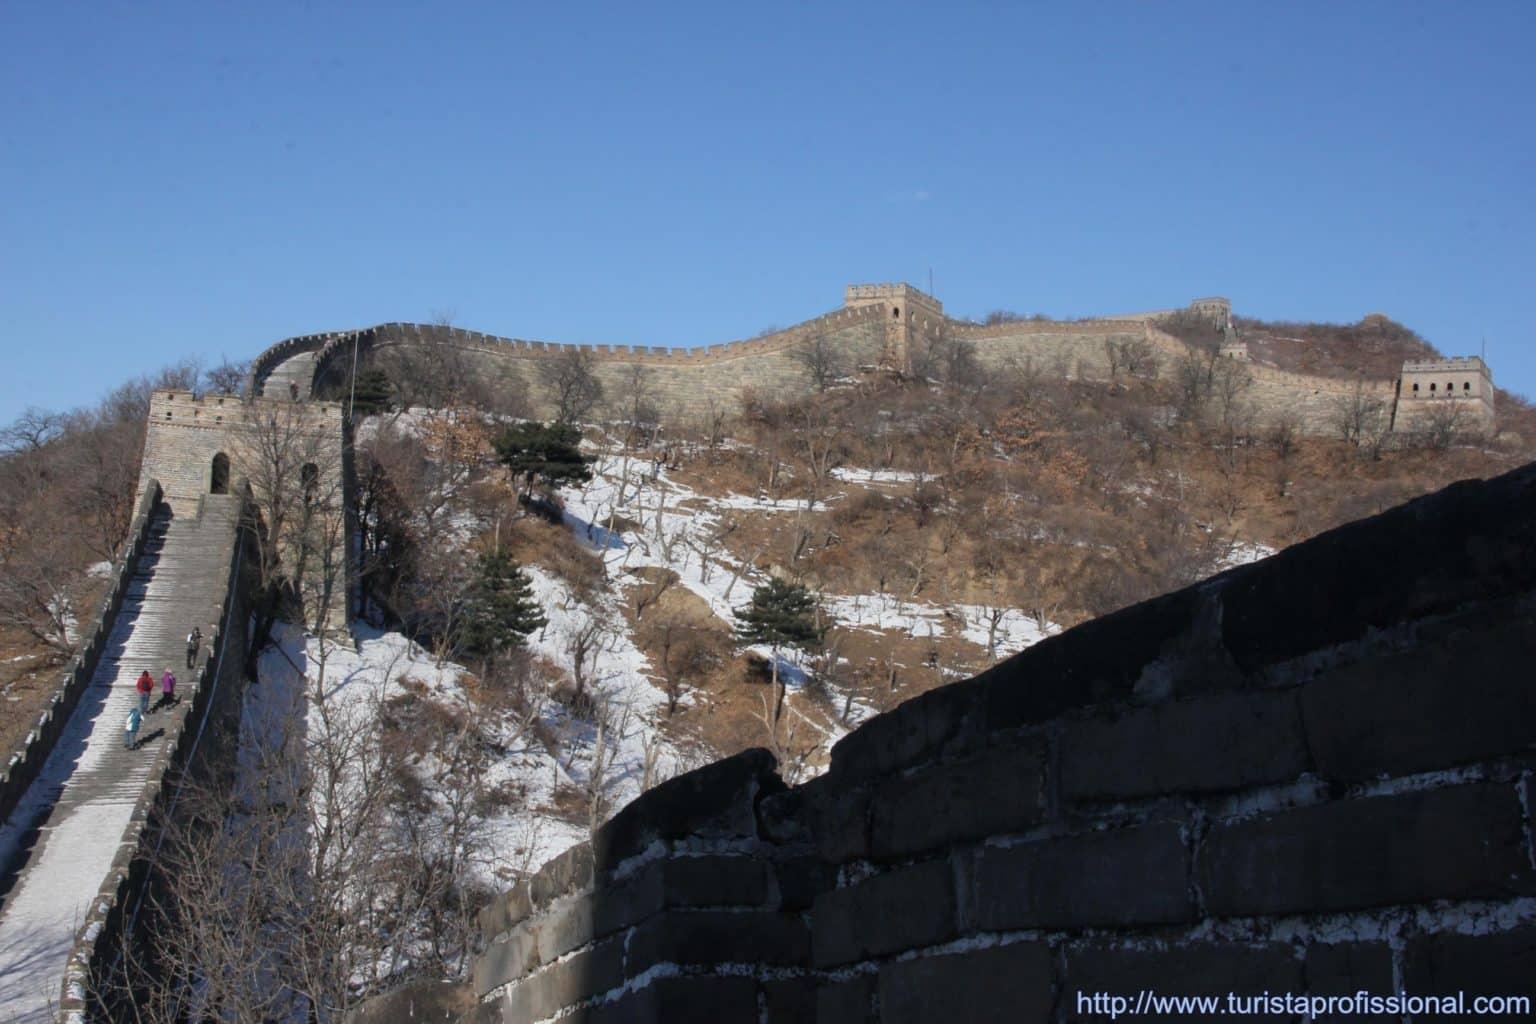 Muralha da China 10 - Olhares | Muralha da China